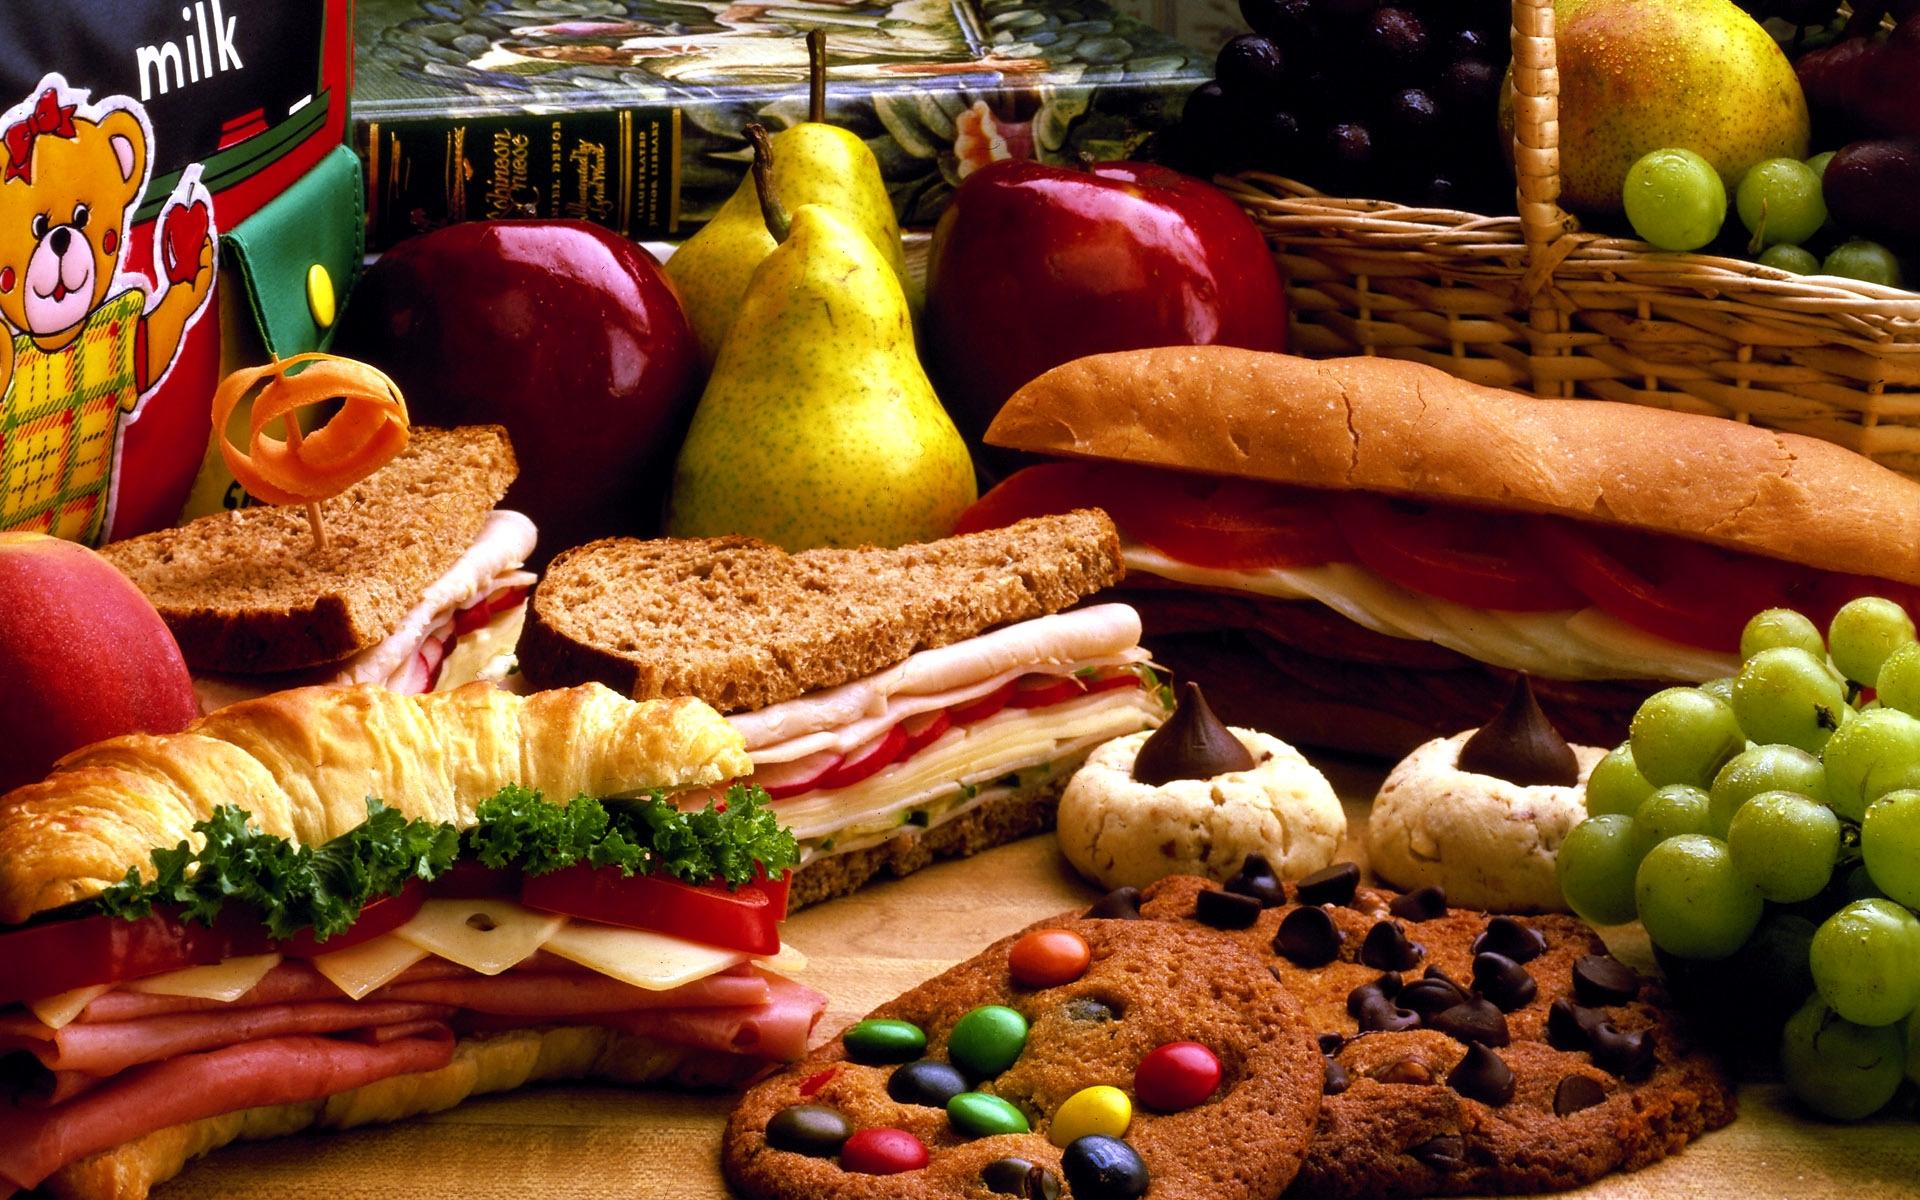 Food Desktop Wallpapers FREE on Latorocom 1920x1200